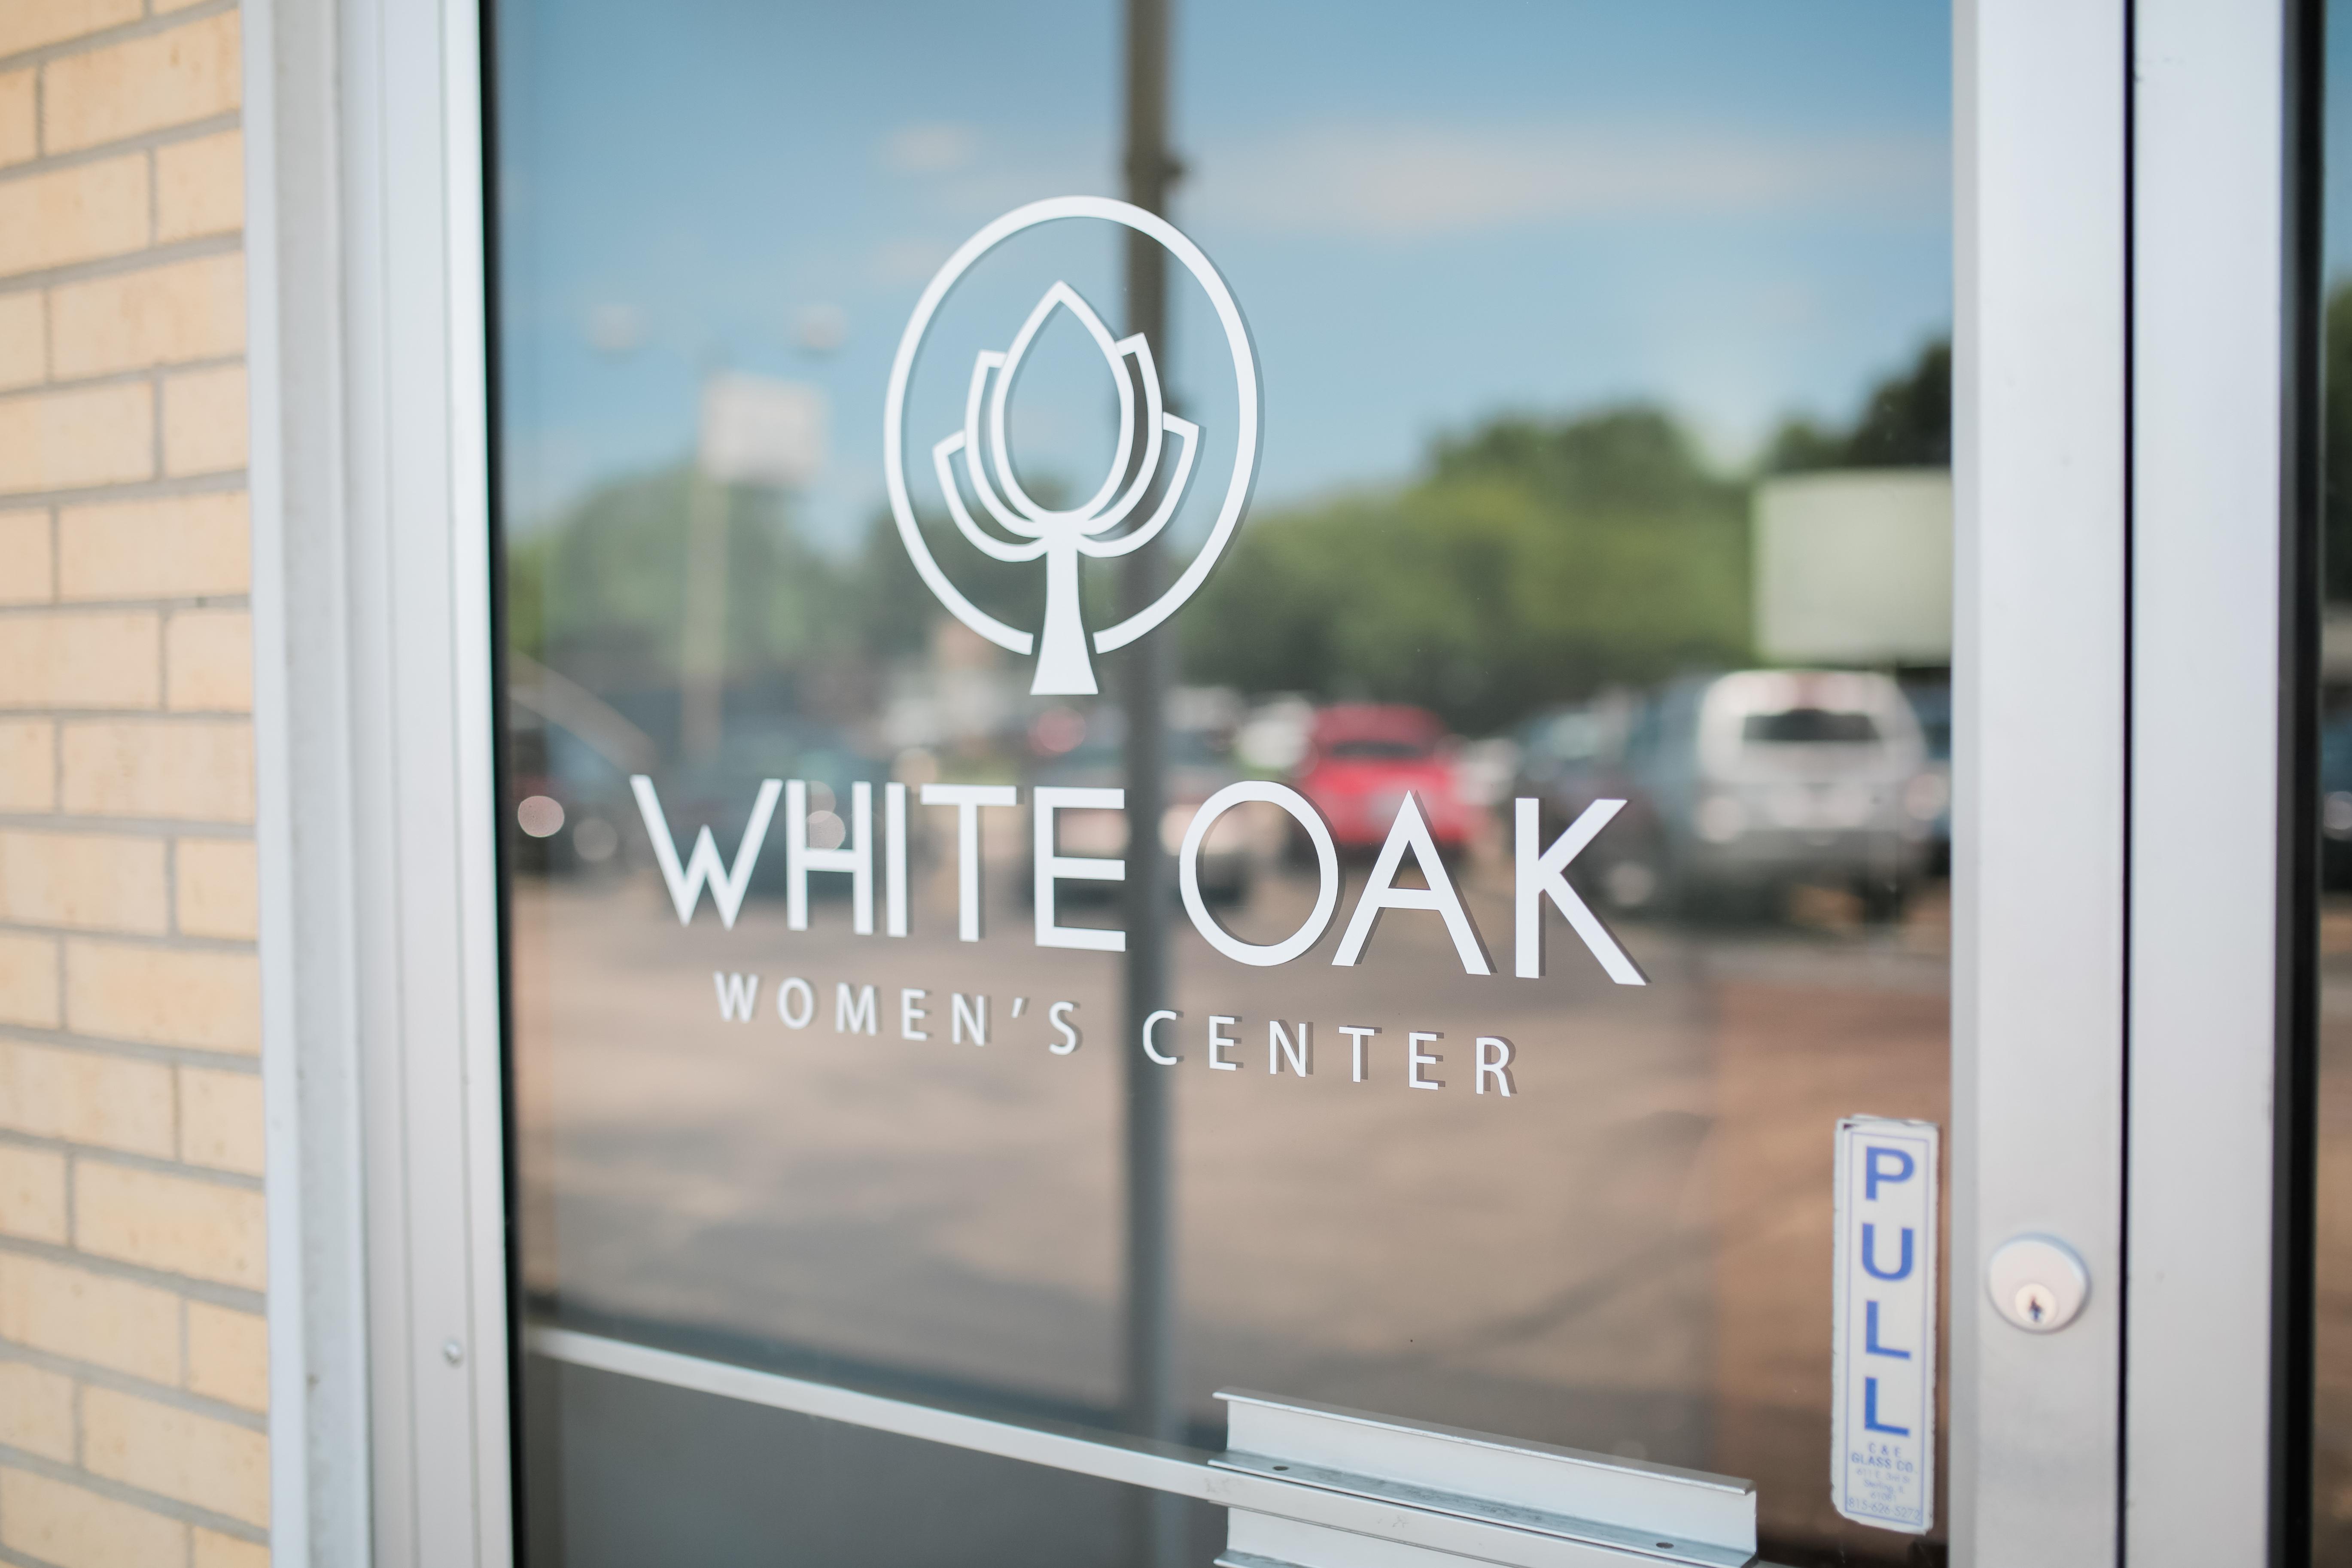 Door to White Oak Women's Center